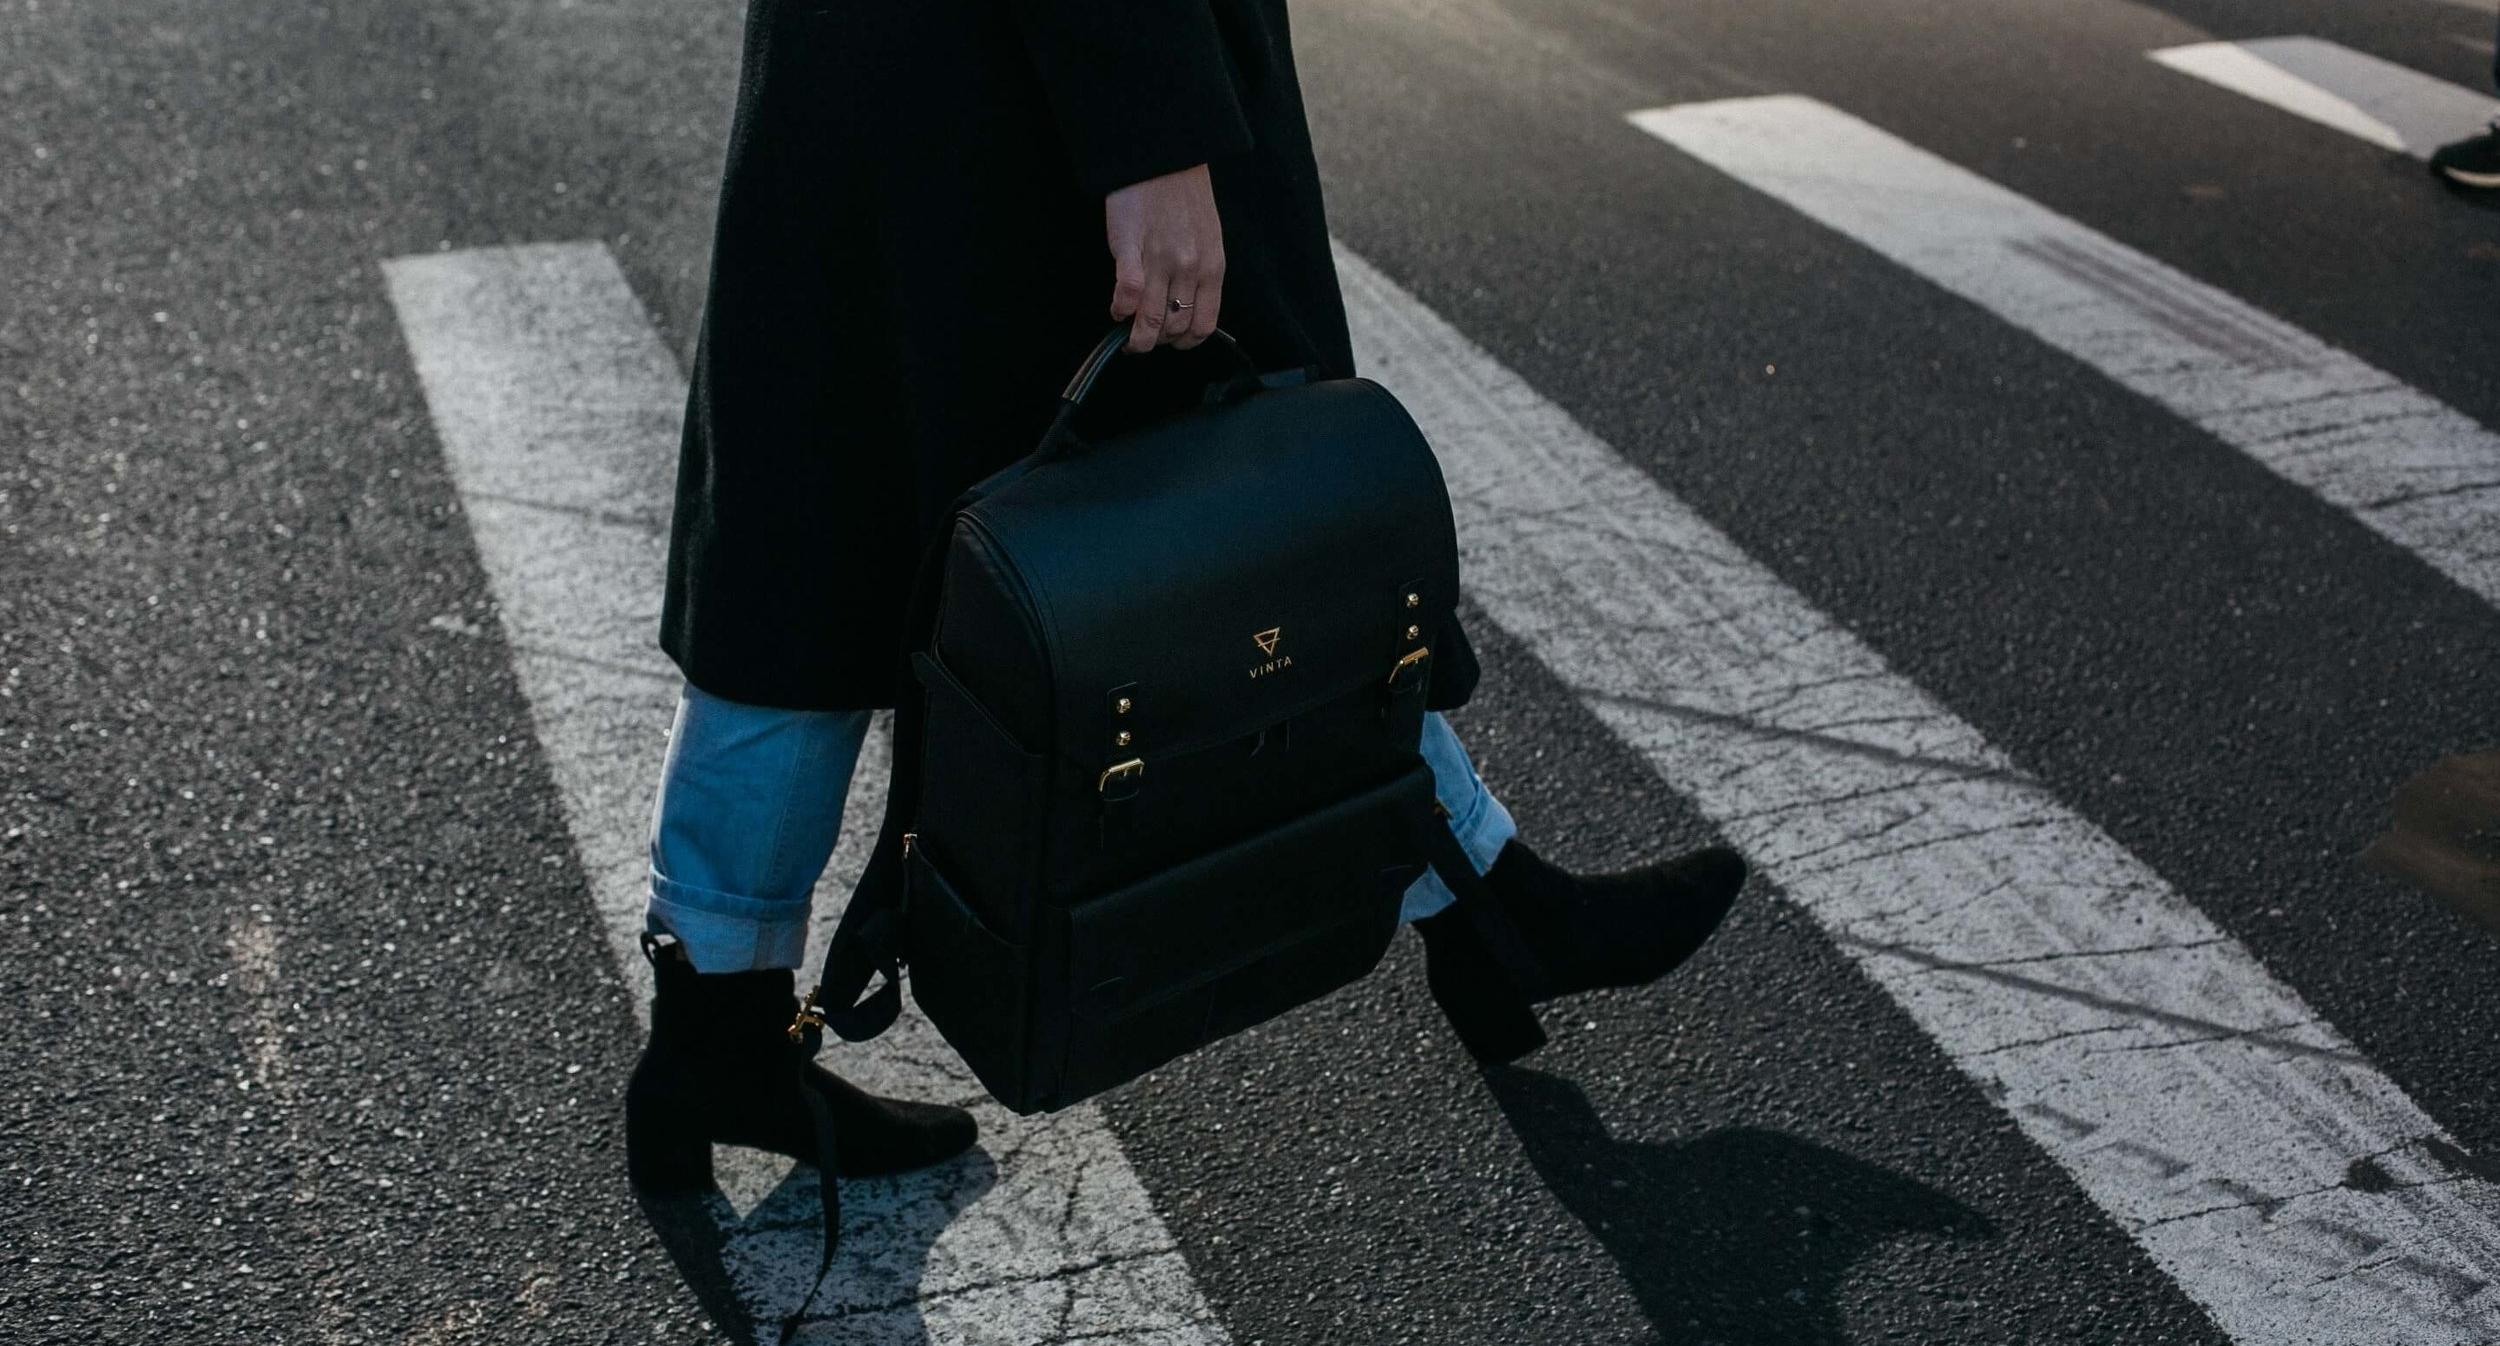 Image: https://www.pexels.com/photo/person-carrying-bag-walking-on-pedestrian-lane-842963/